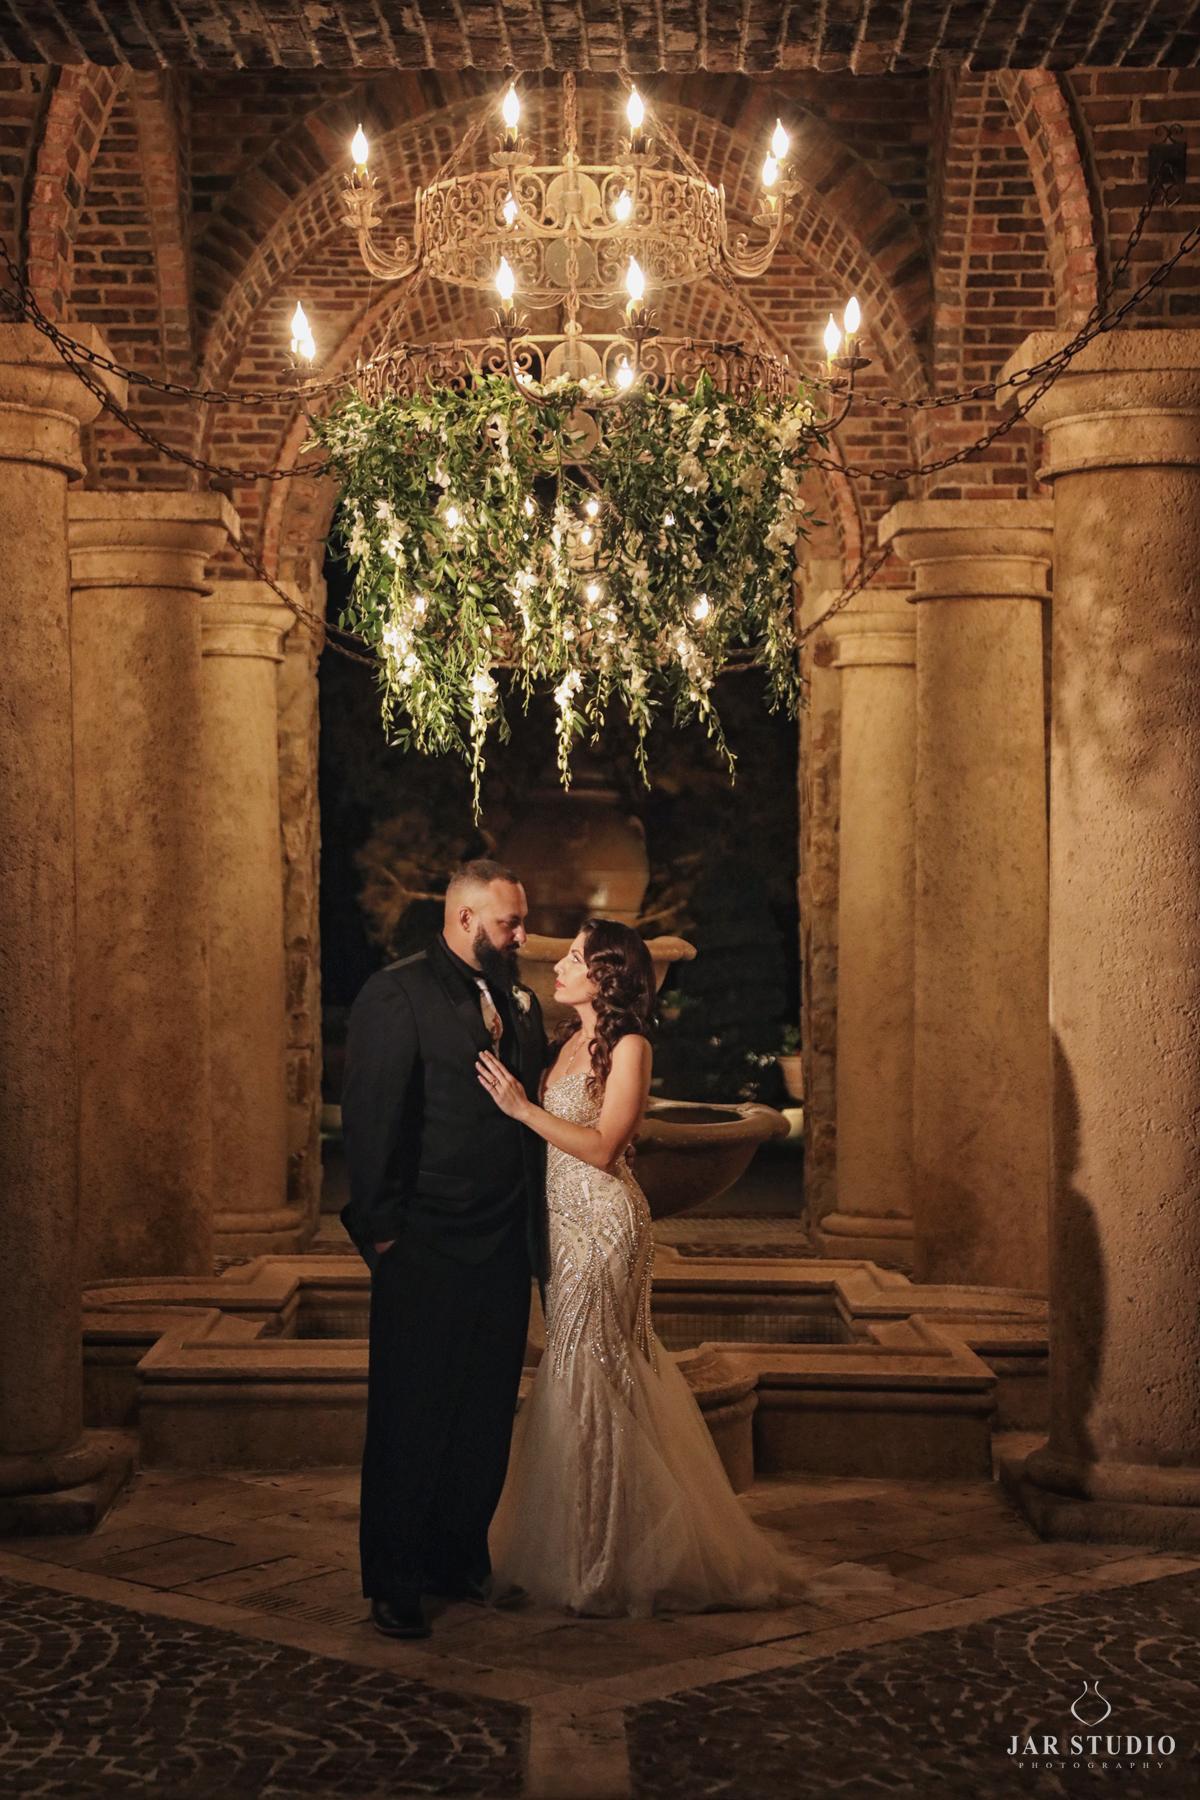 42-jarstudio-amazing-bridal-portraits-bella-collina.jpg